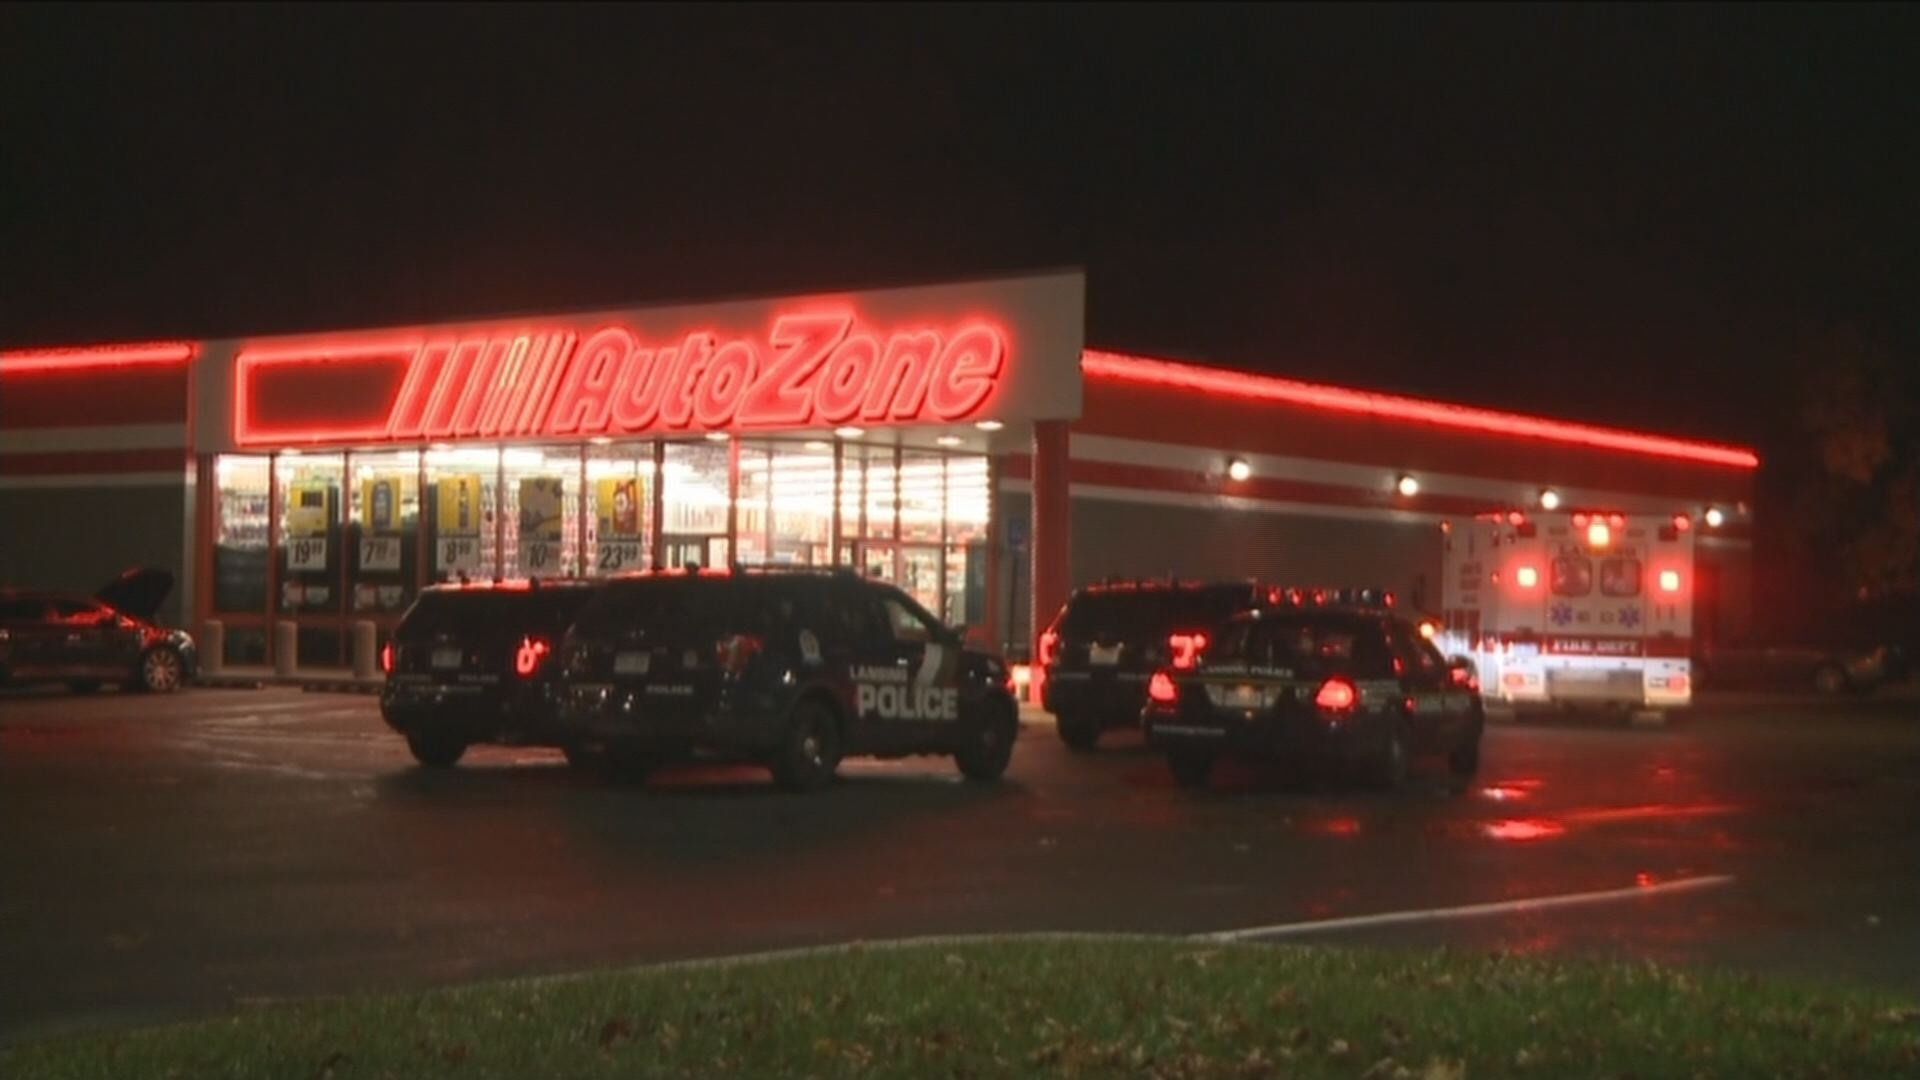 Man shot near Lansing Auto Zone location 1920x1080